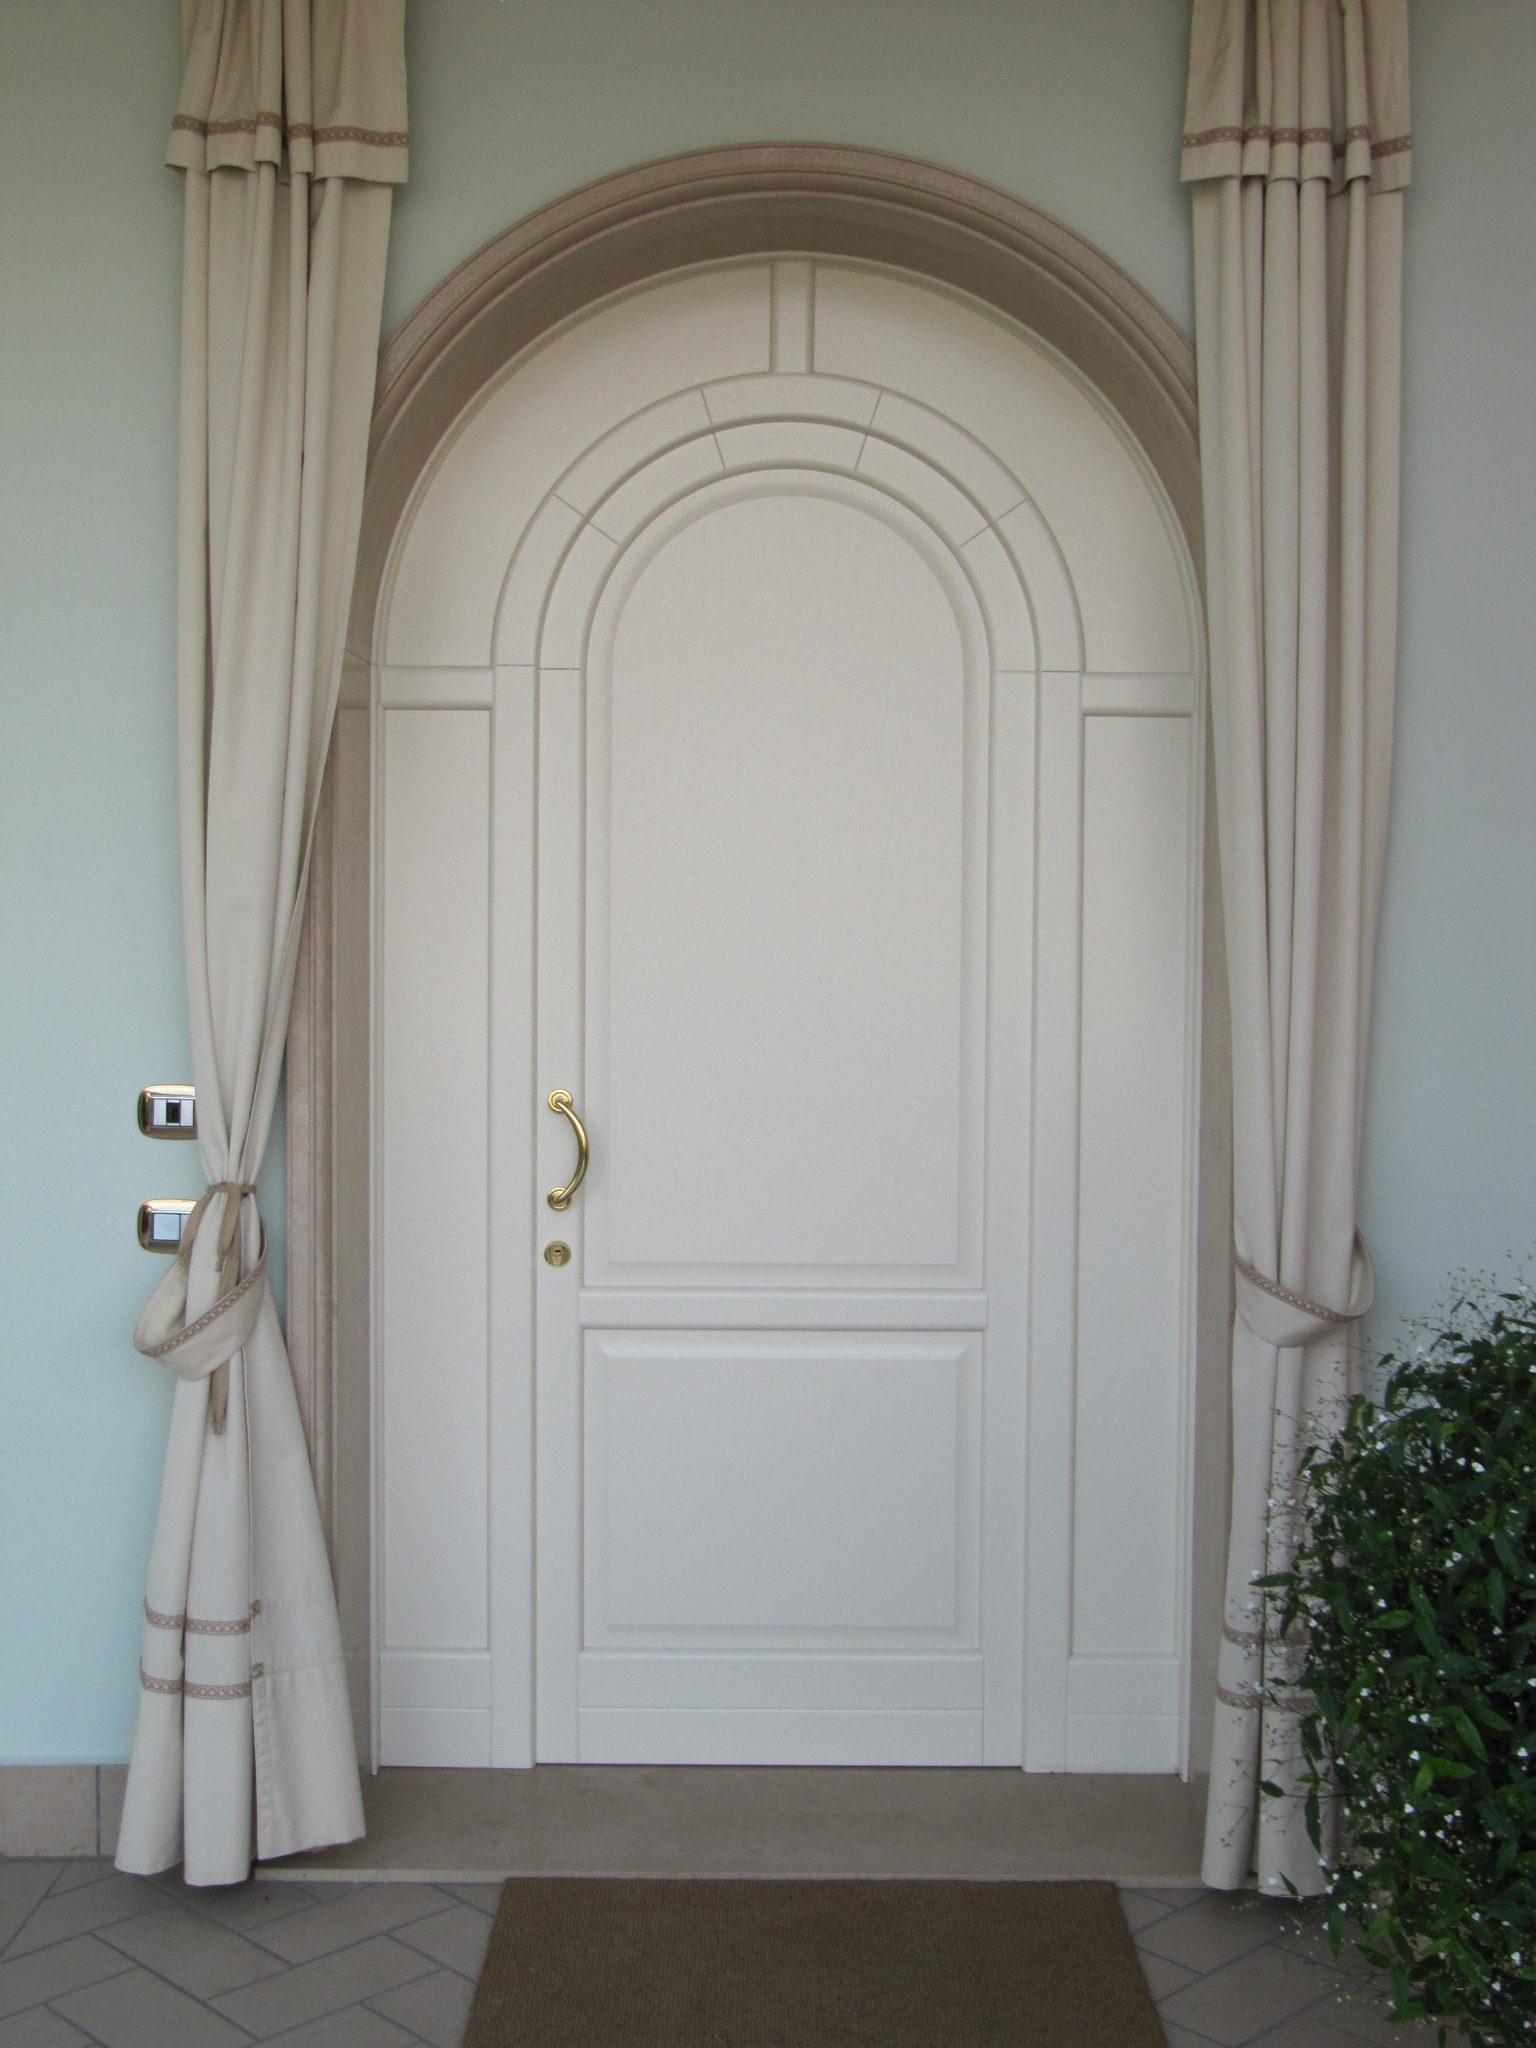 Falegnameria Pirondini - Porte d'ingresso in legno